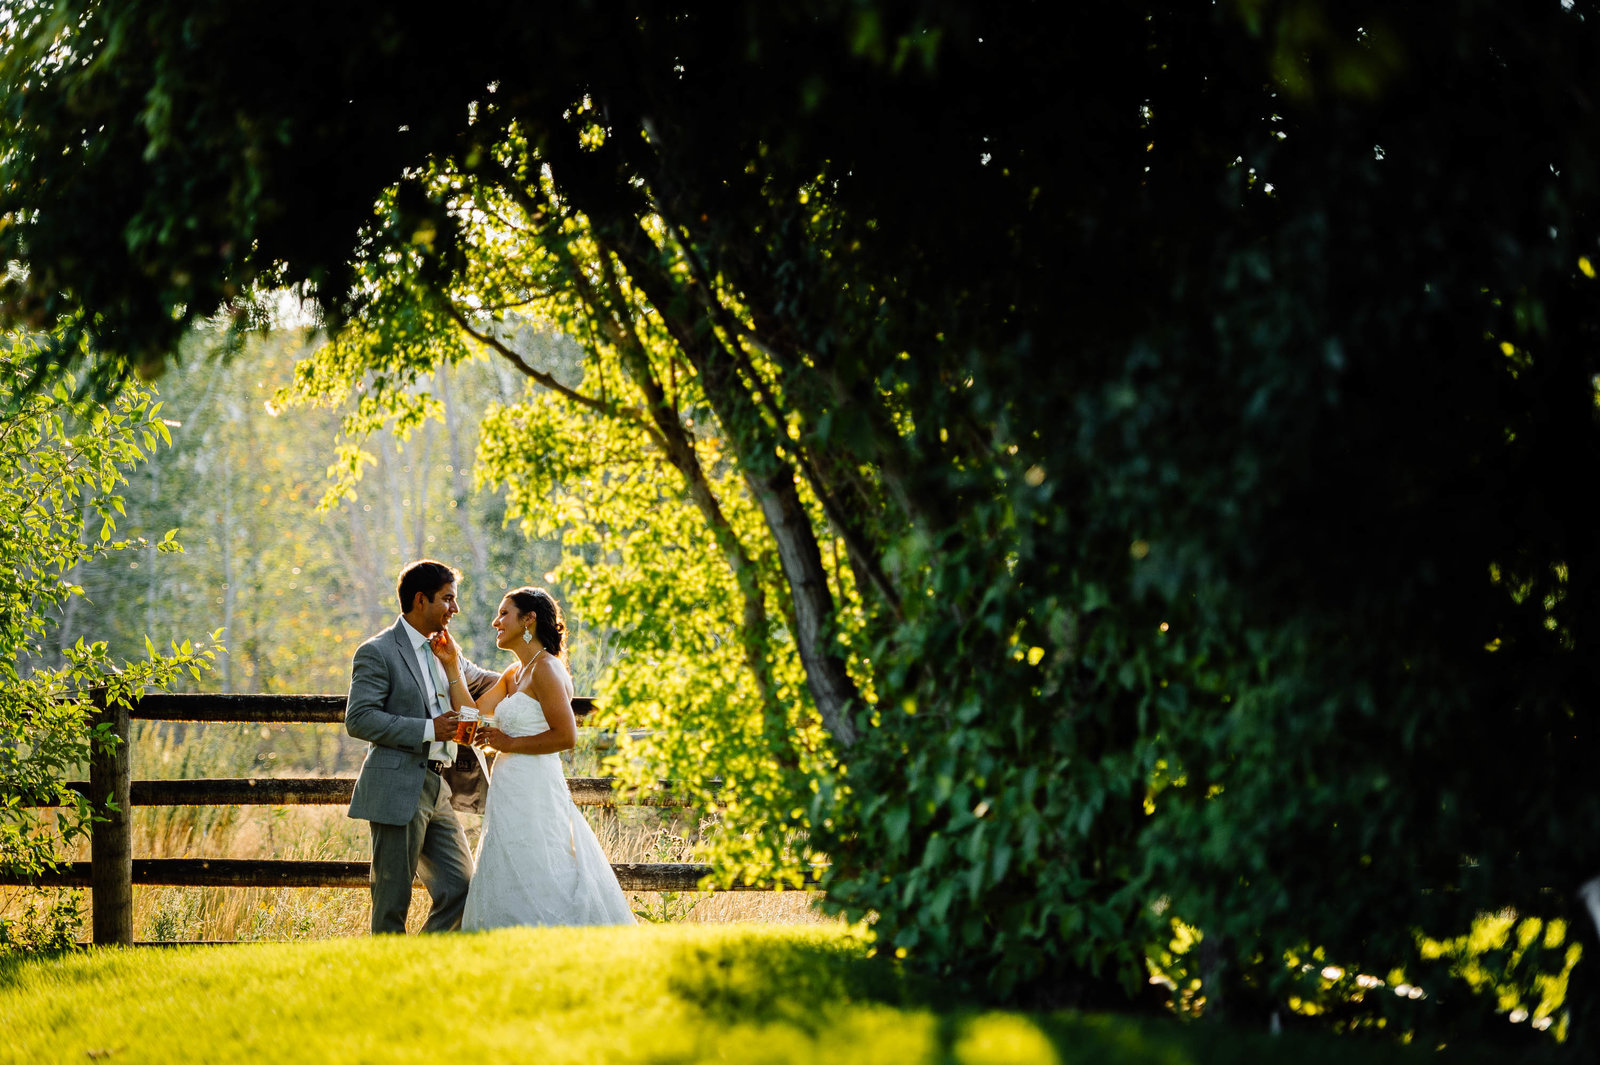 307-El-paso-wedding-photographer-KaCh_0494